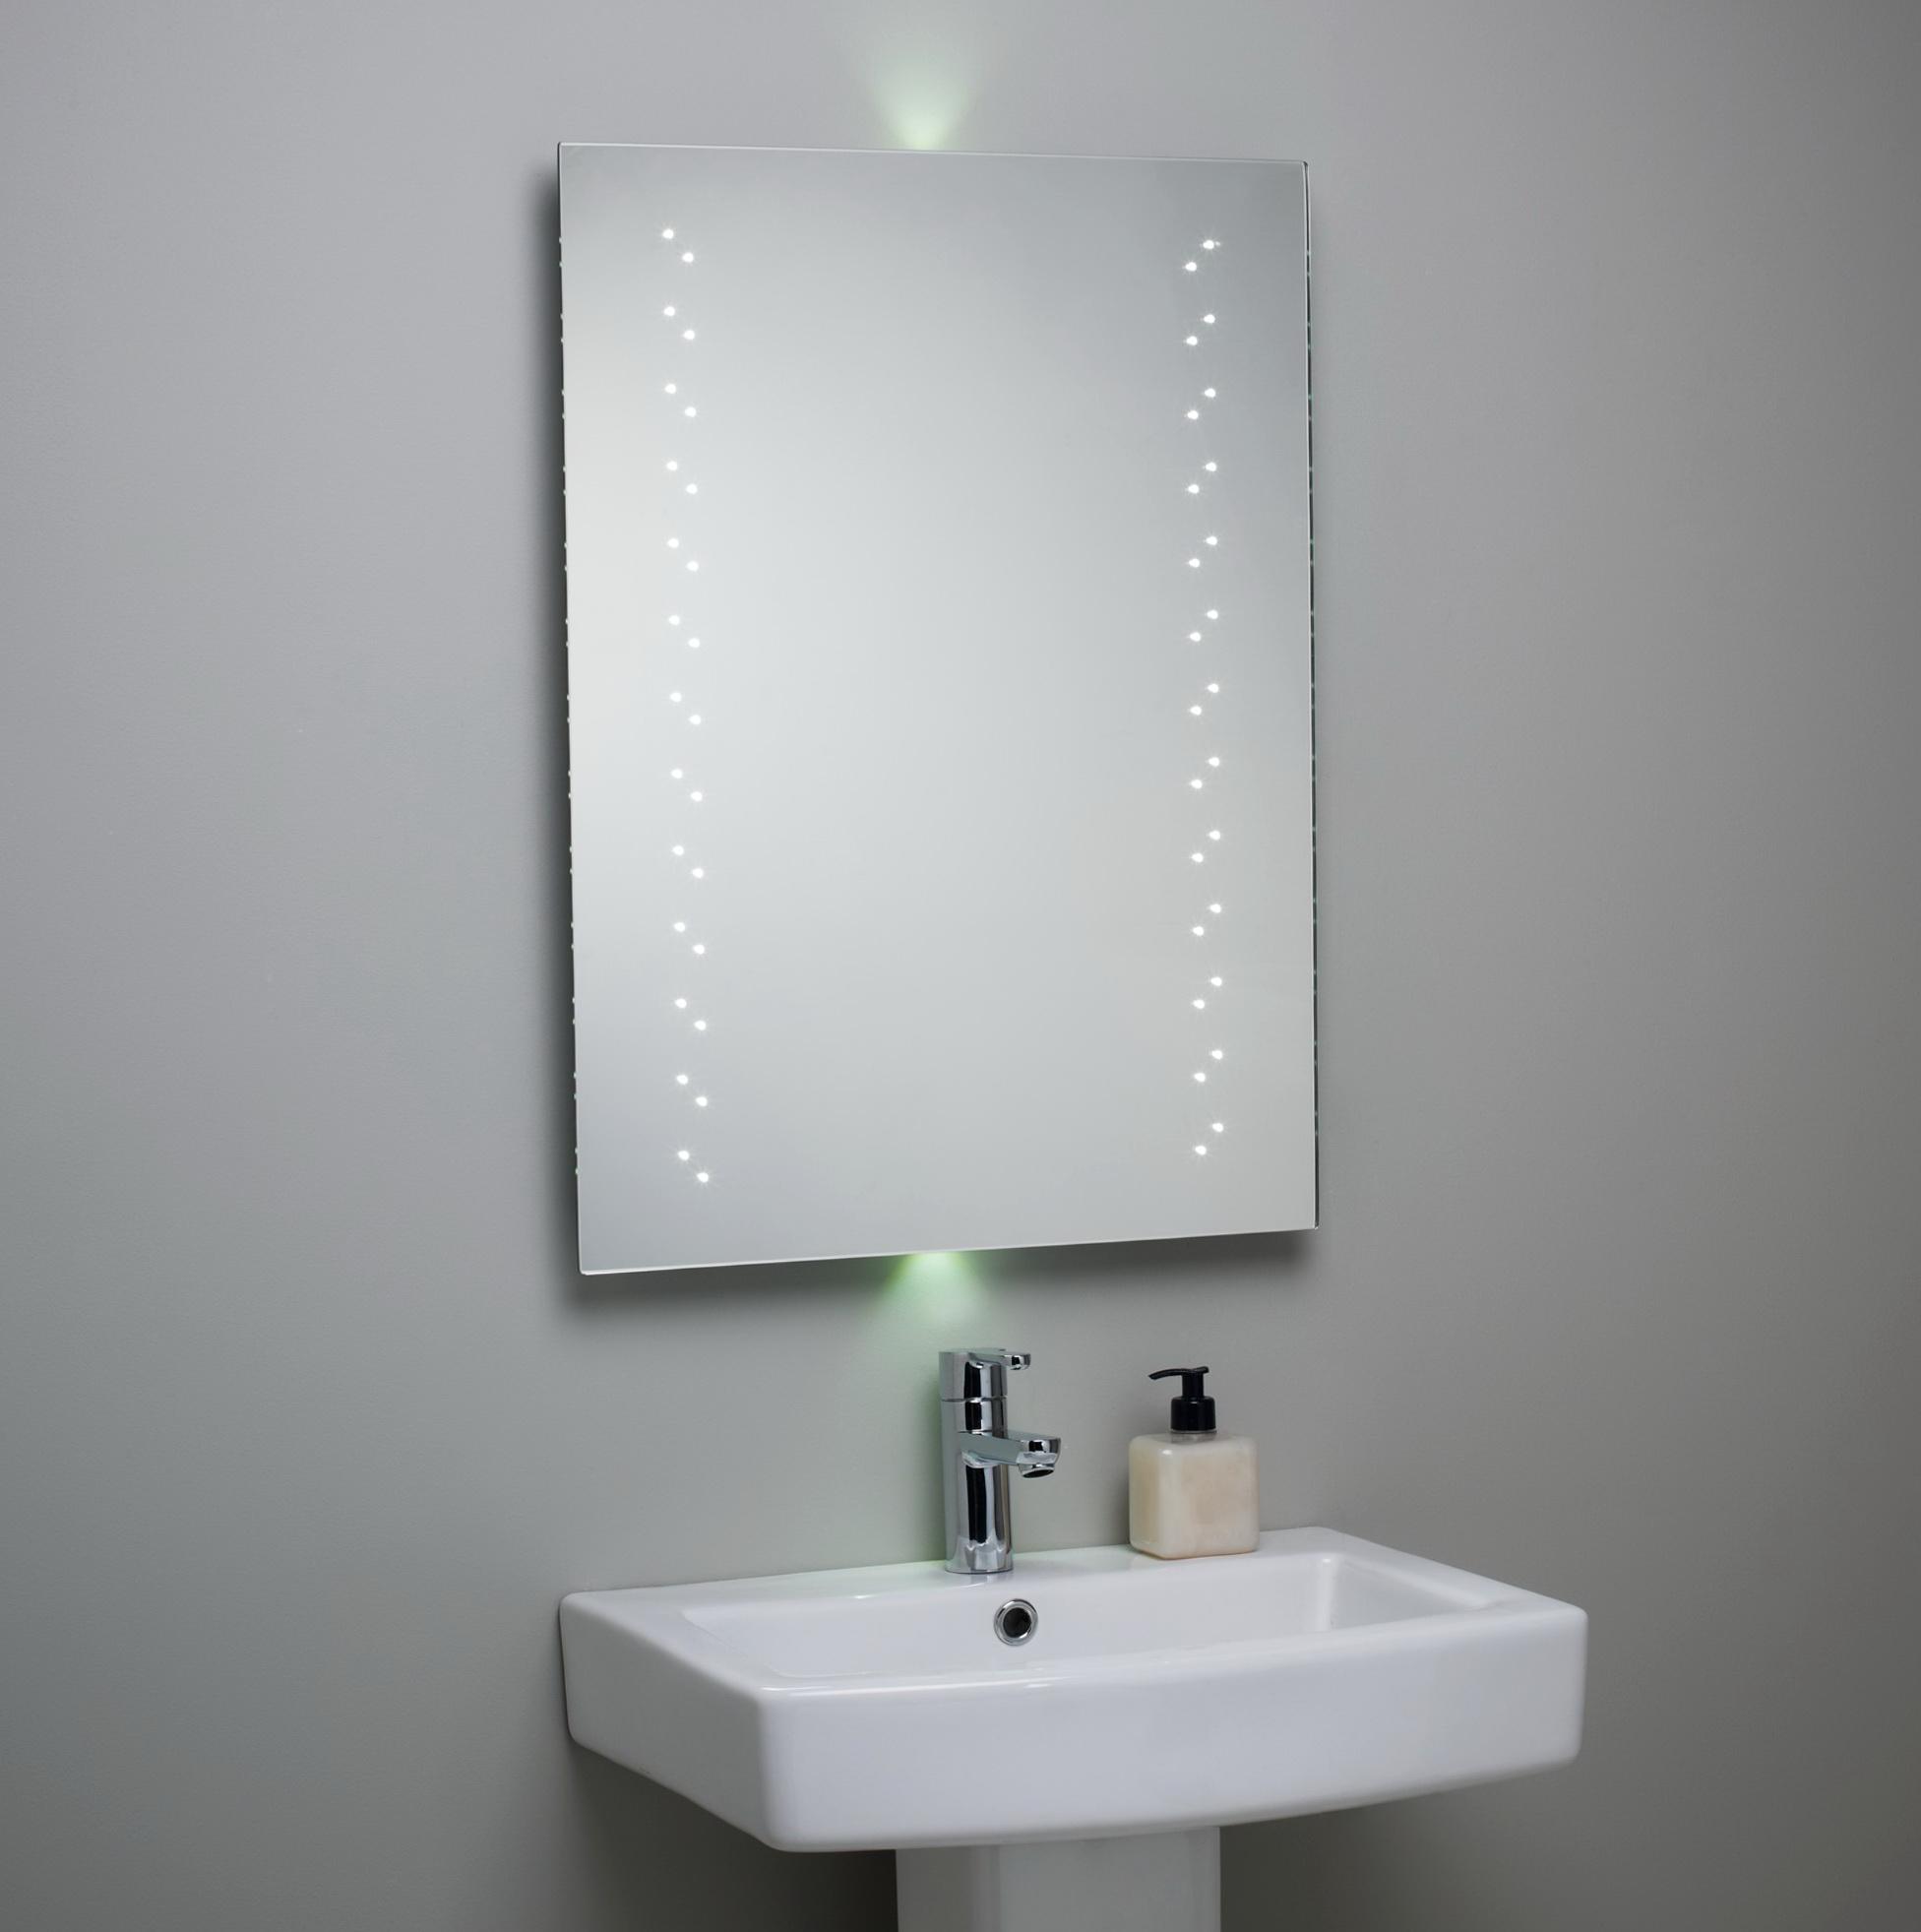 Bathroom mirror with lights behind home design ideas for Bathroom mirrors with lights behind